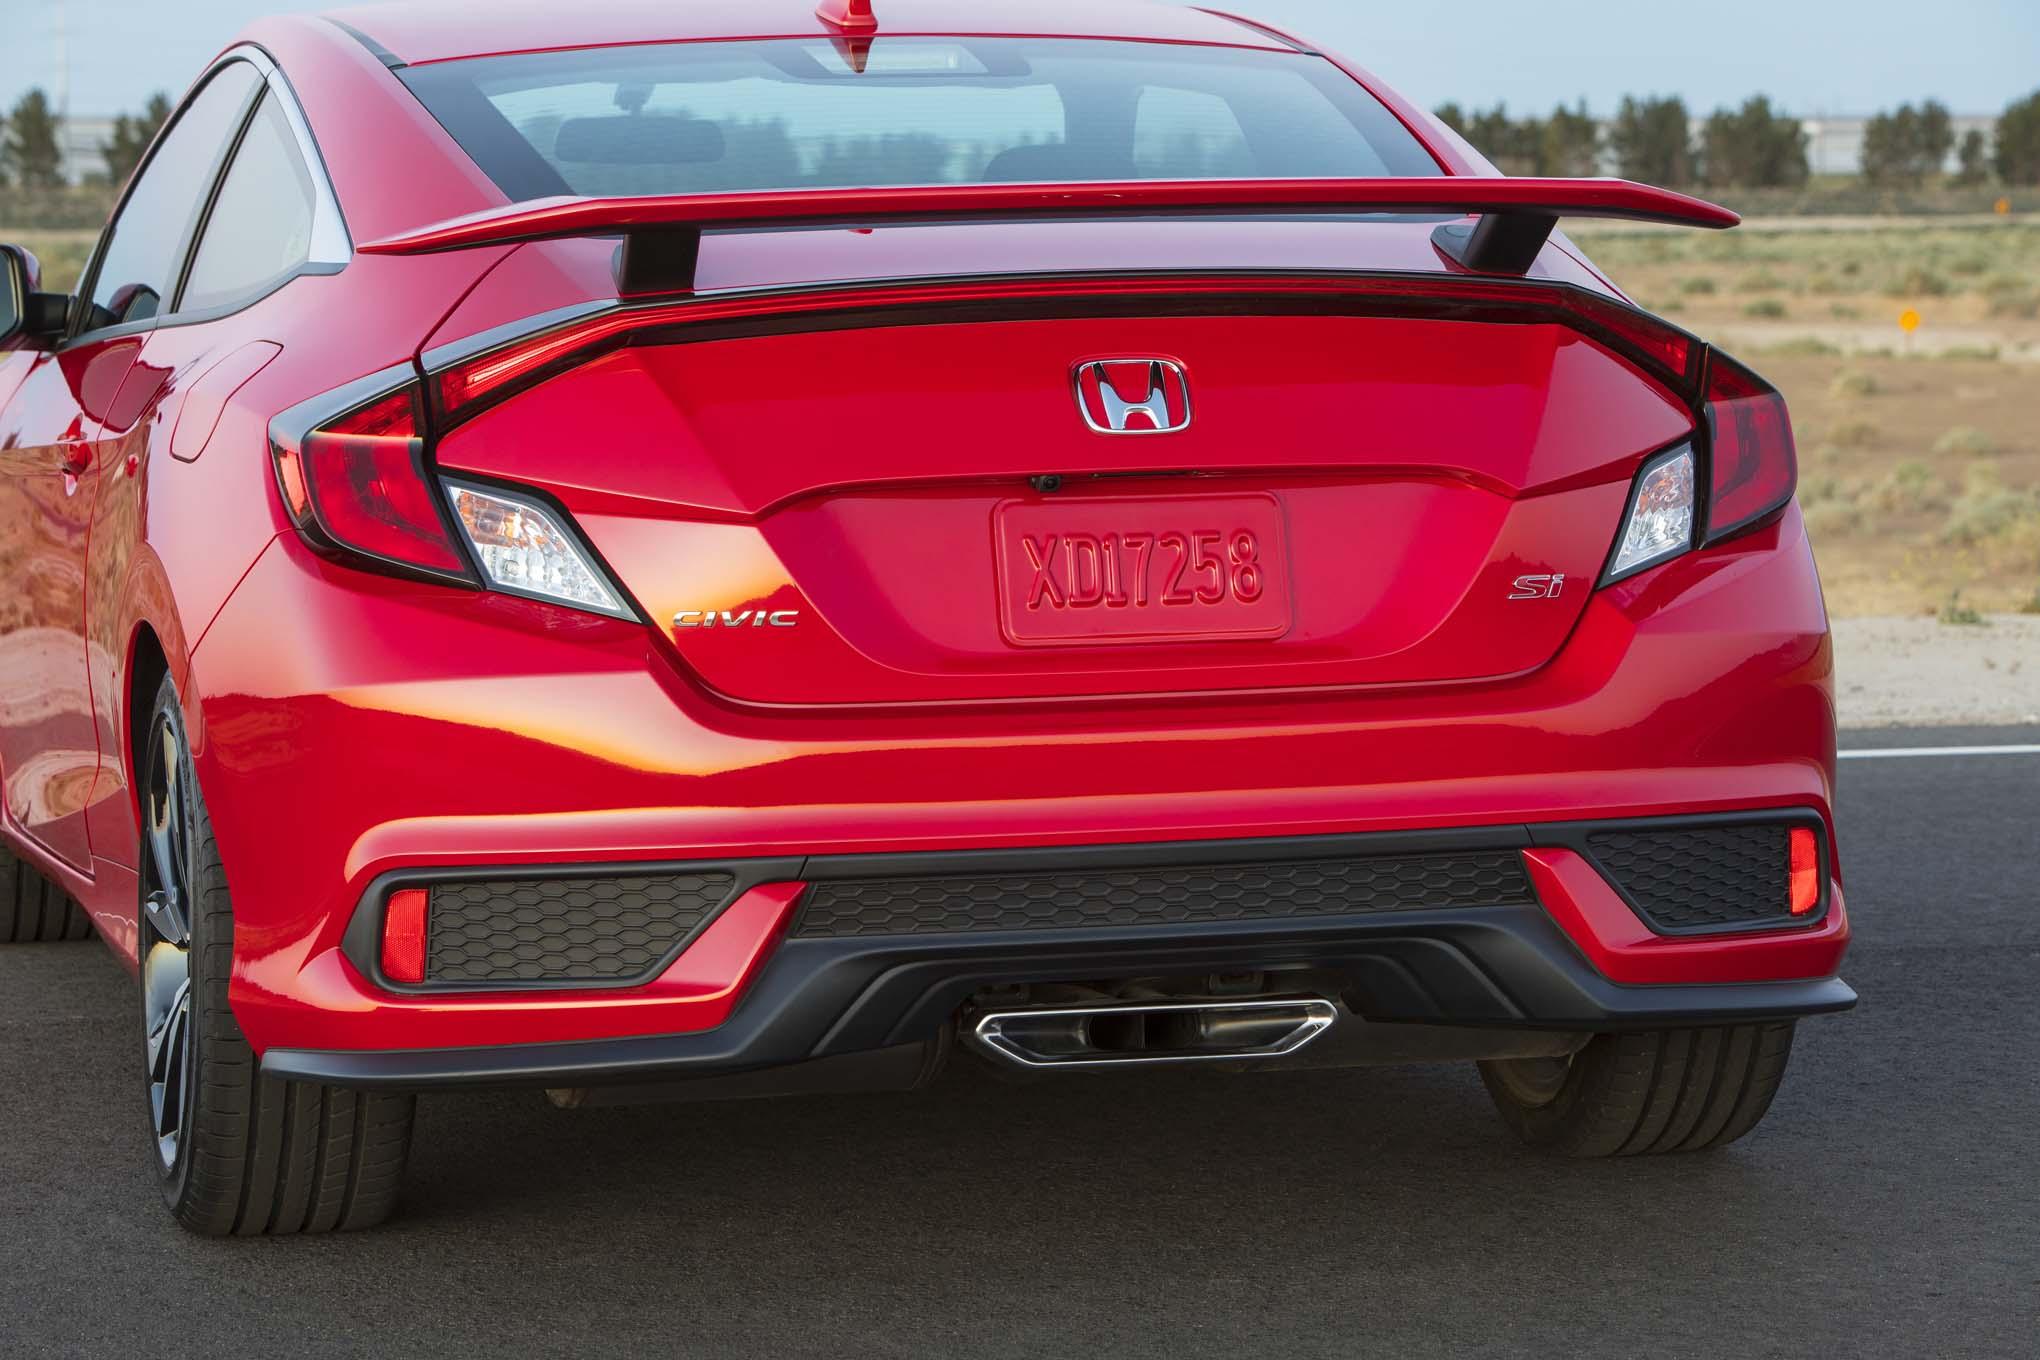 Honda Limited 2017 Civic Si Power To Increase Engine Longevity